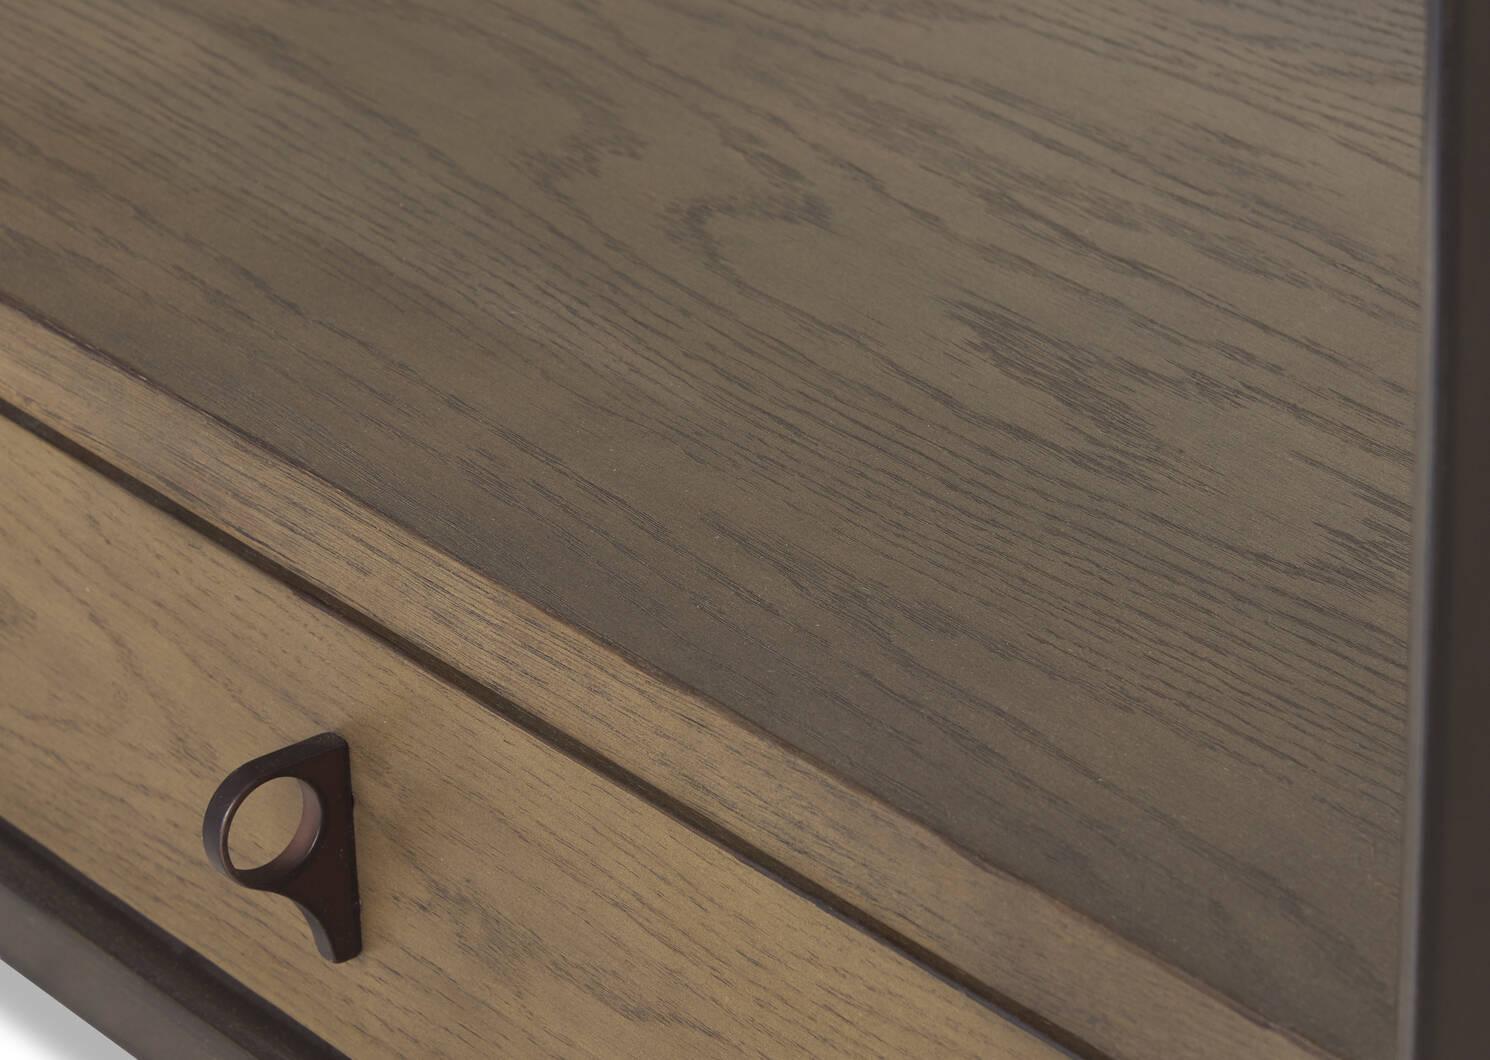 Haden Coffee Table -Madri Sand